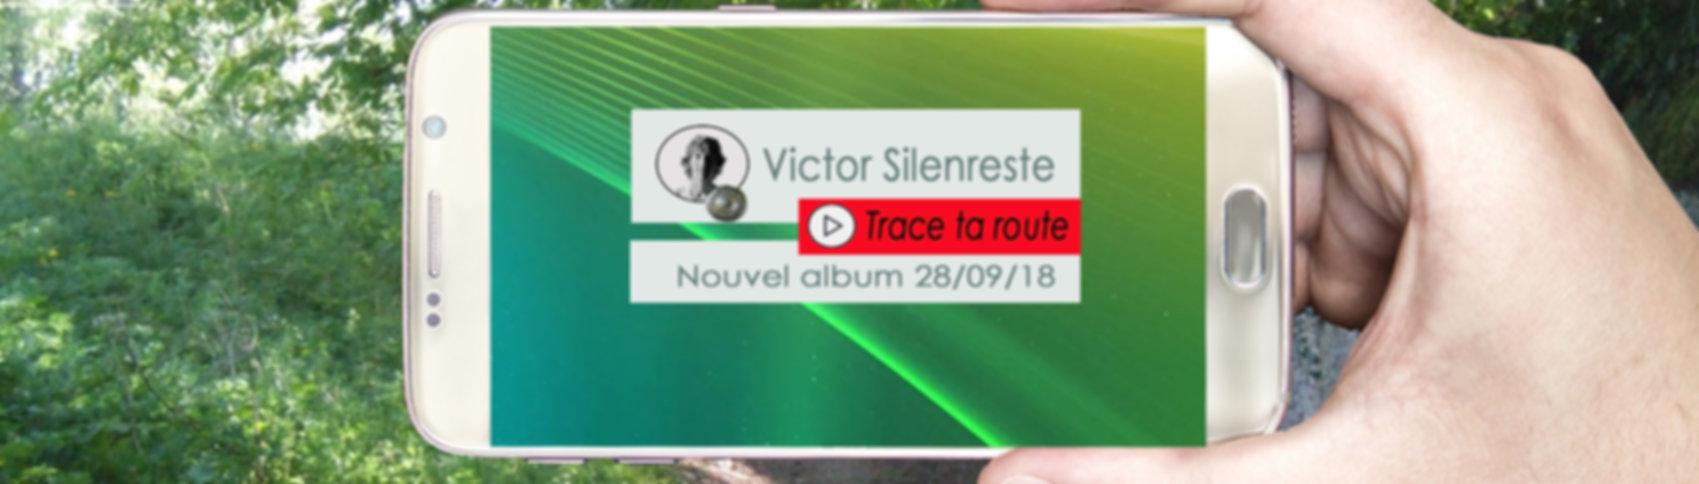 Victor Silenreste trace ta roue